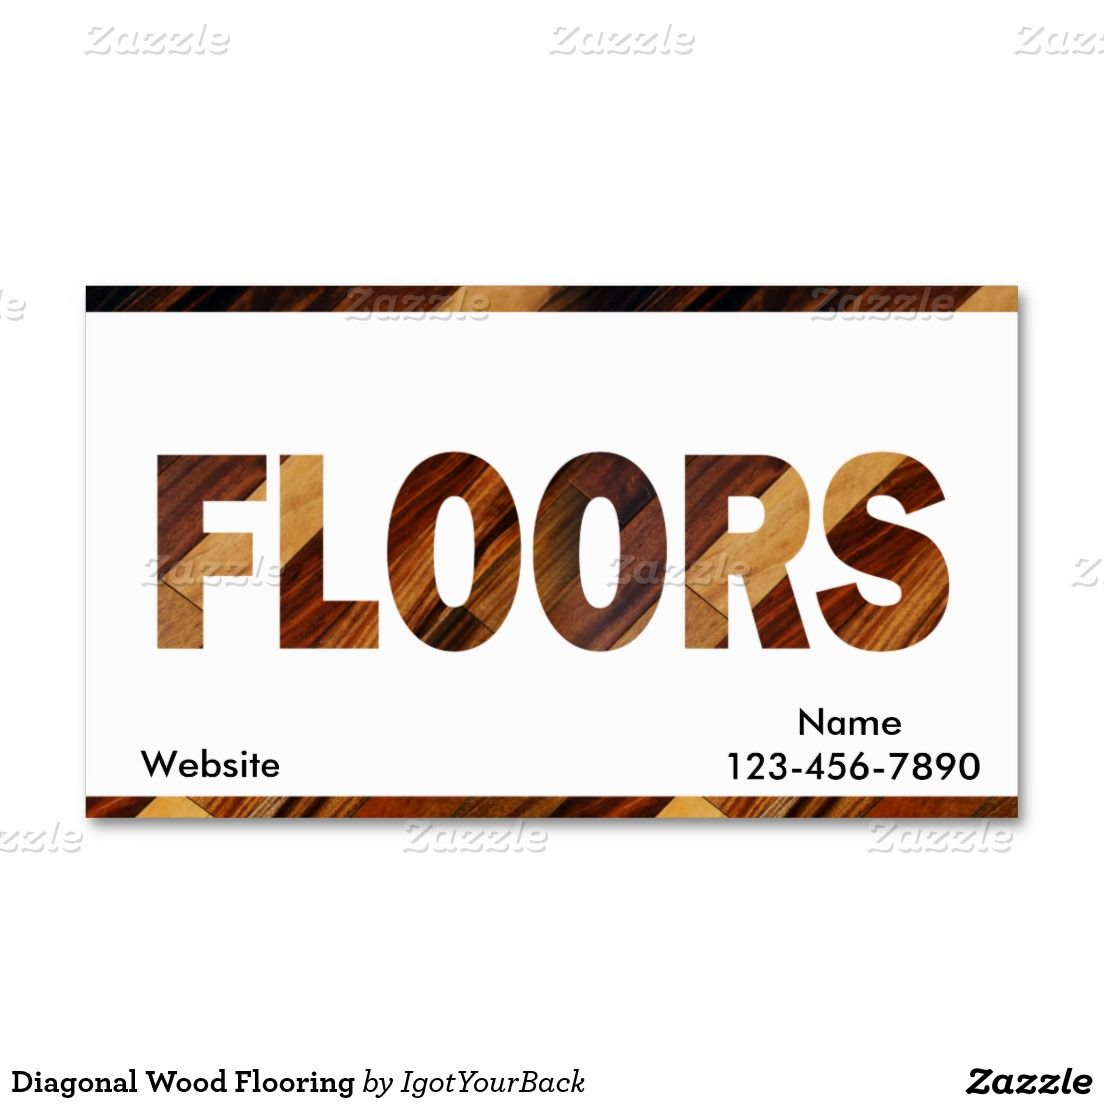 Diagonal Wood Flooring Business Card Wood Flooring Business Cards